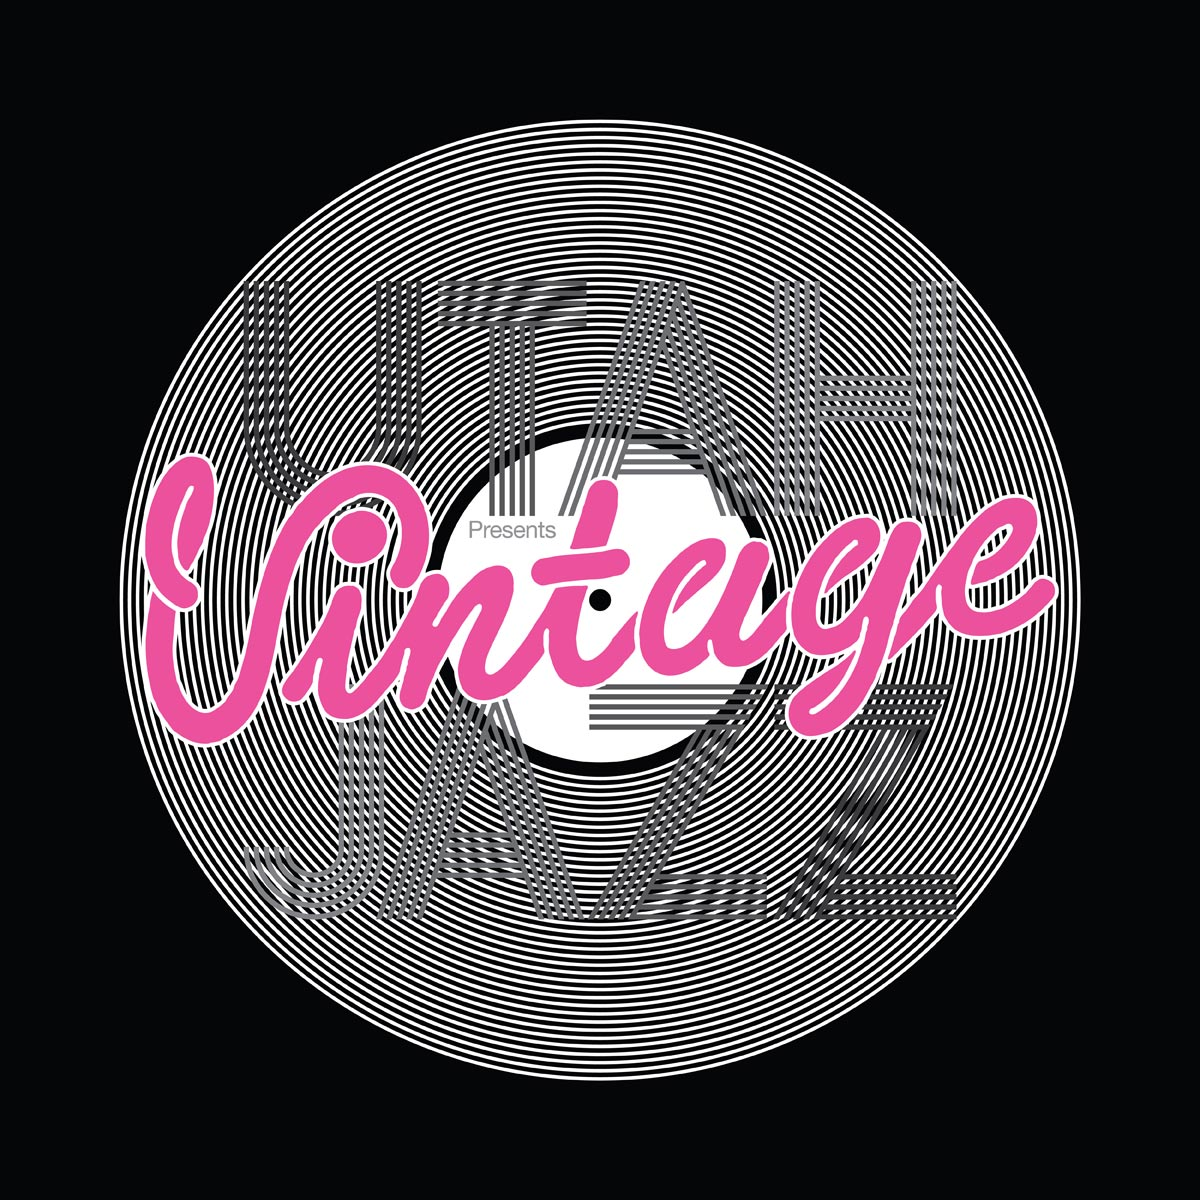 Studio Oscar - VINTAGE LP